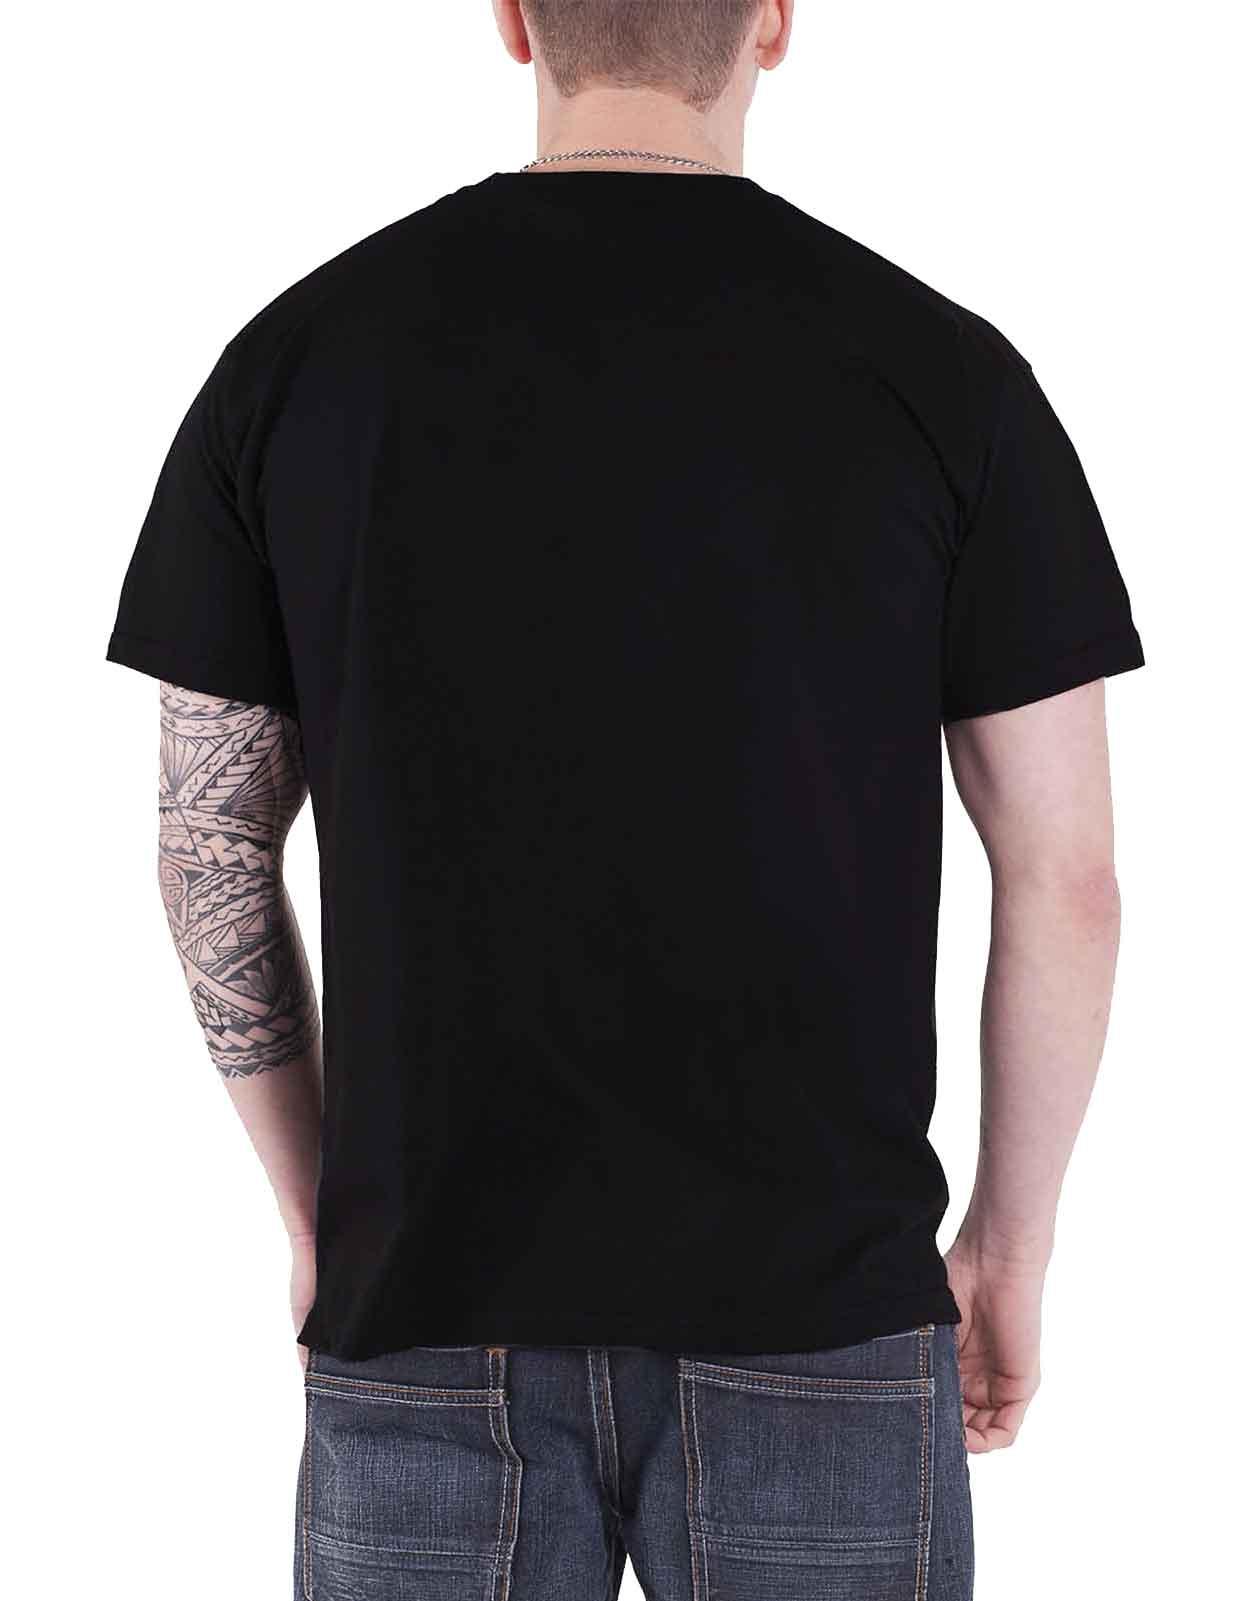 Officiel-Hawkwind-T-Shirt-Warrior-on-the-Edge-Space-Ritual-Doremi-homme-nouveau miniature 9